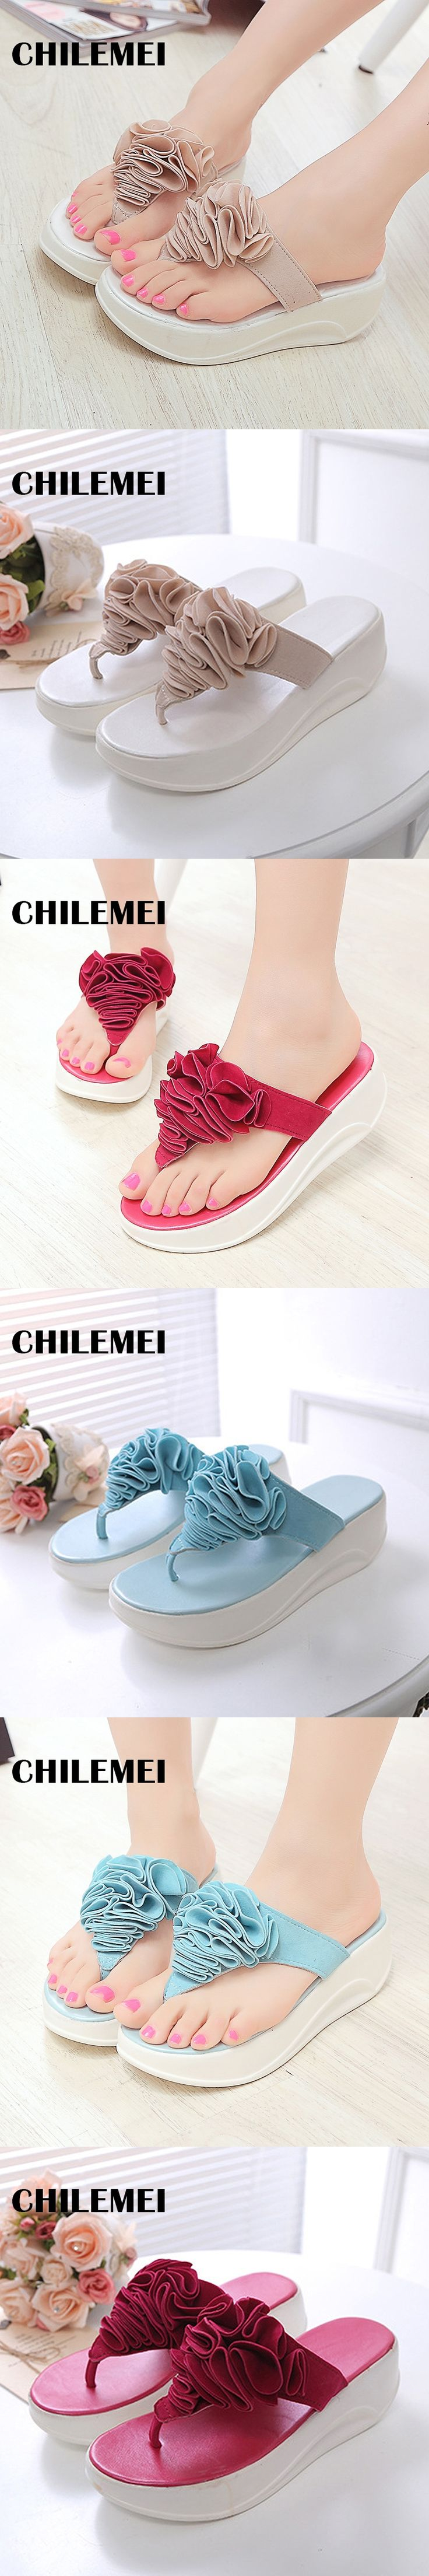 High Heel Slippers Platform Sandals Ladies Wedges Sandals Brand Flip Flops Summer Waterproof Shoes Women Beach Slippers